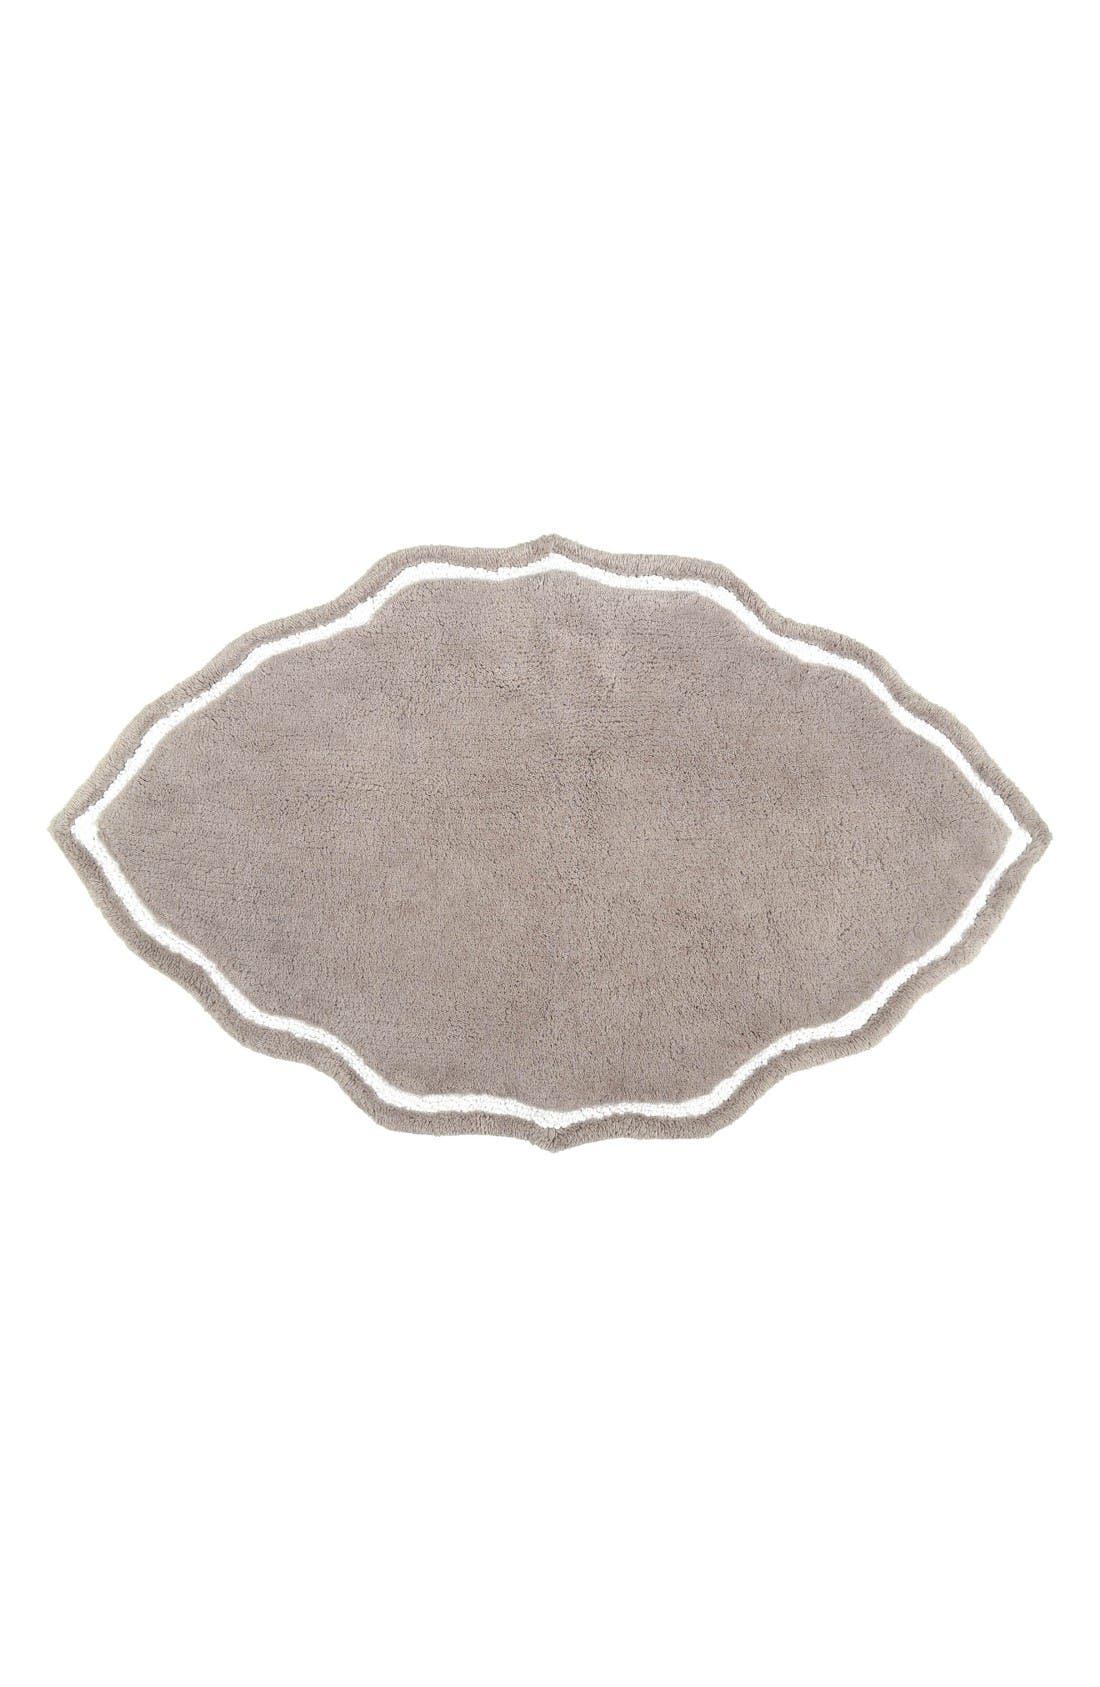 Signature Tufted Bath Rug,                         Main,                         color, Grey